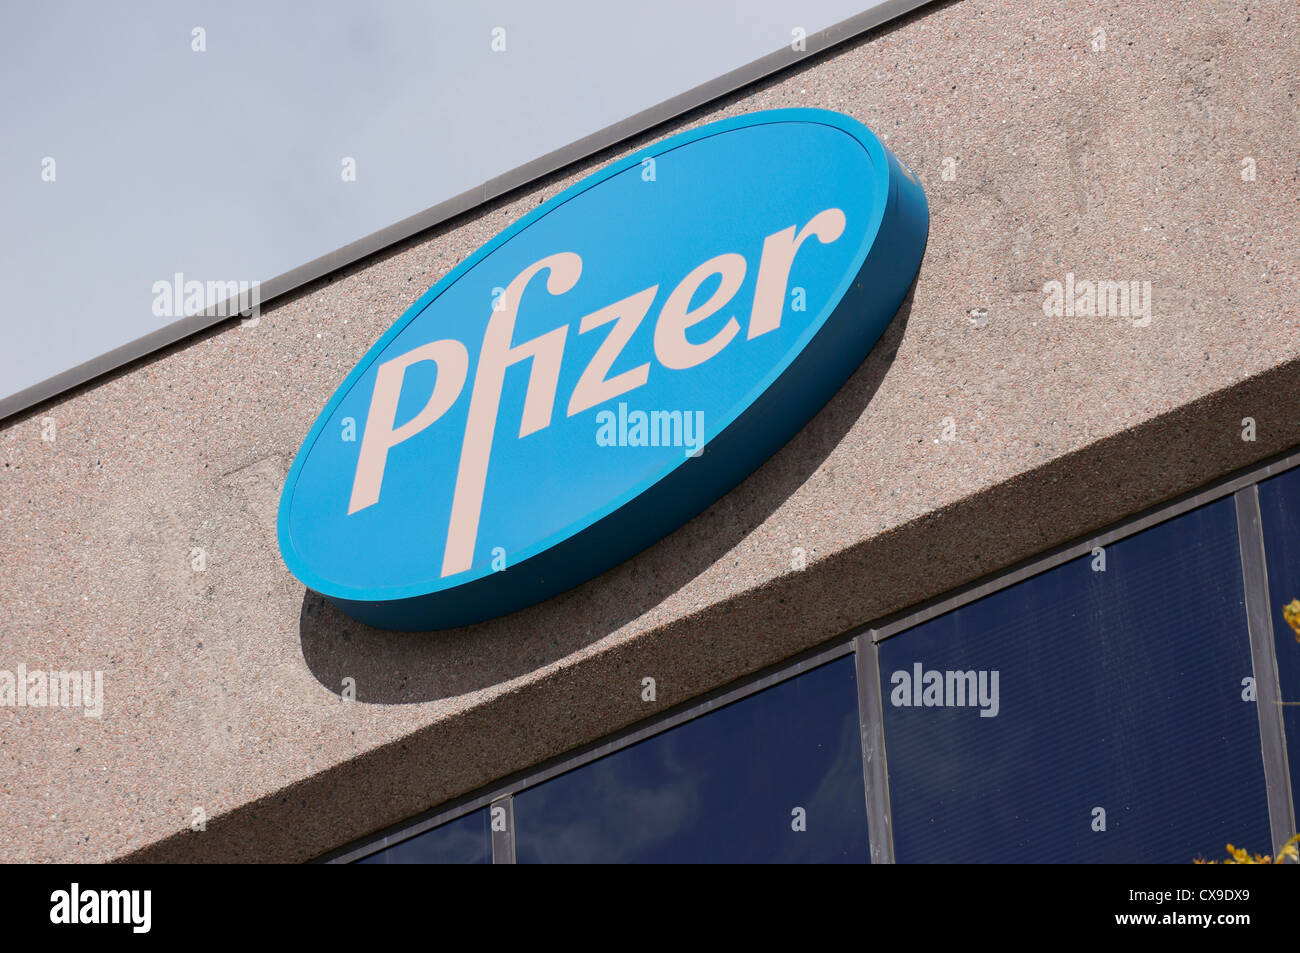 Pfizer pharmaceutical company sign, logo - Stock Image